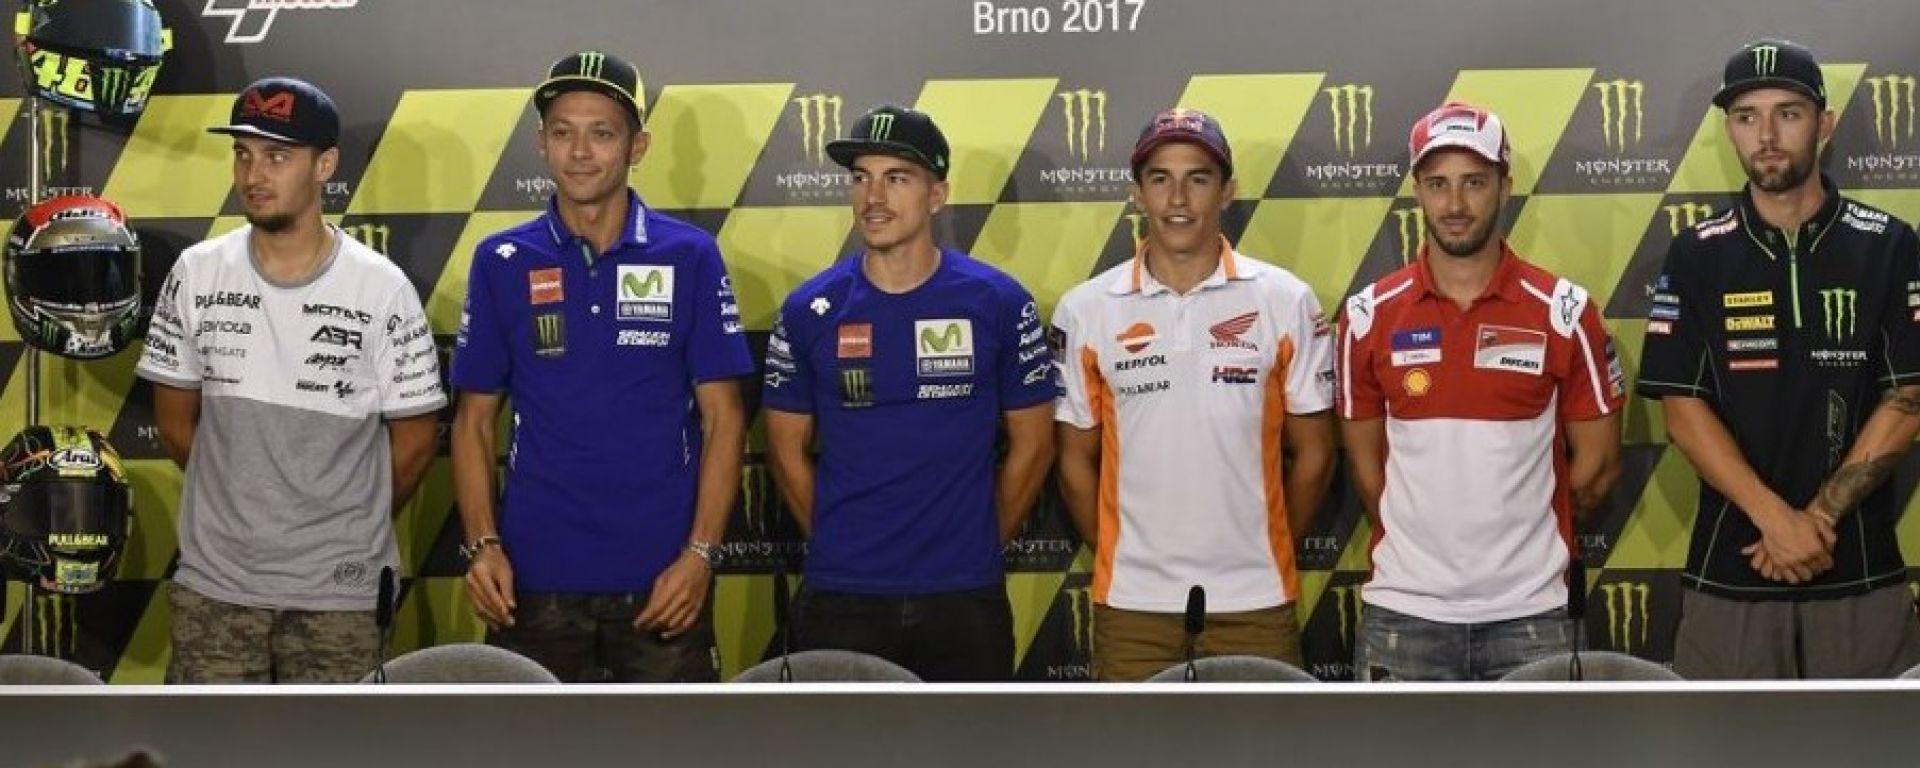 MotoGP Repubblica Ceca 2017, conferenza stampa